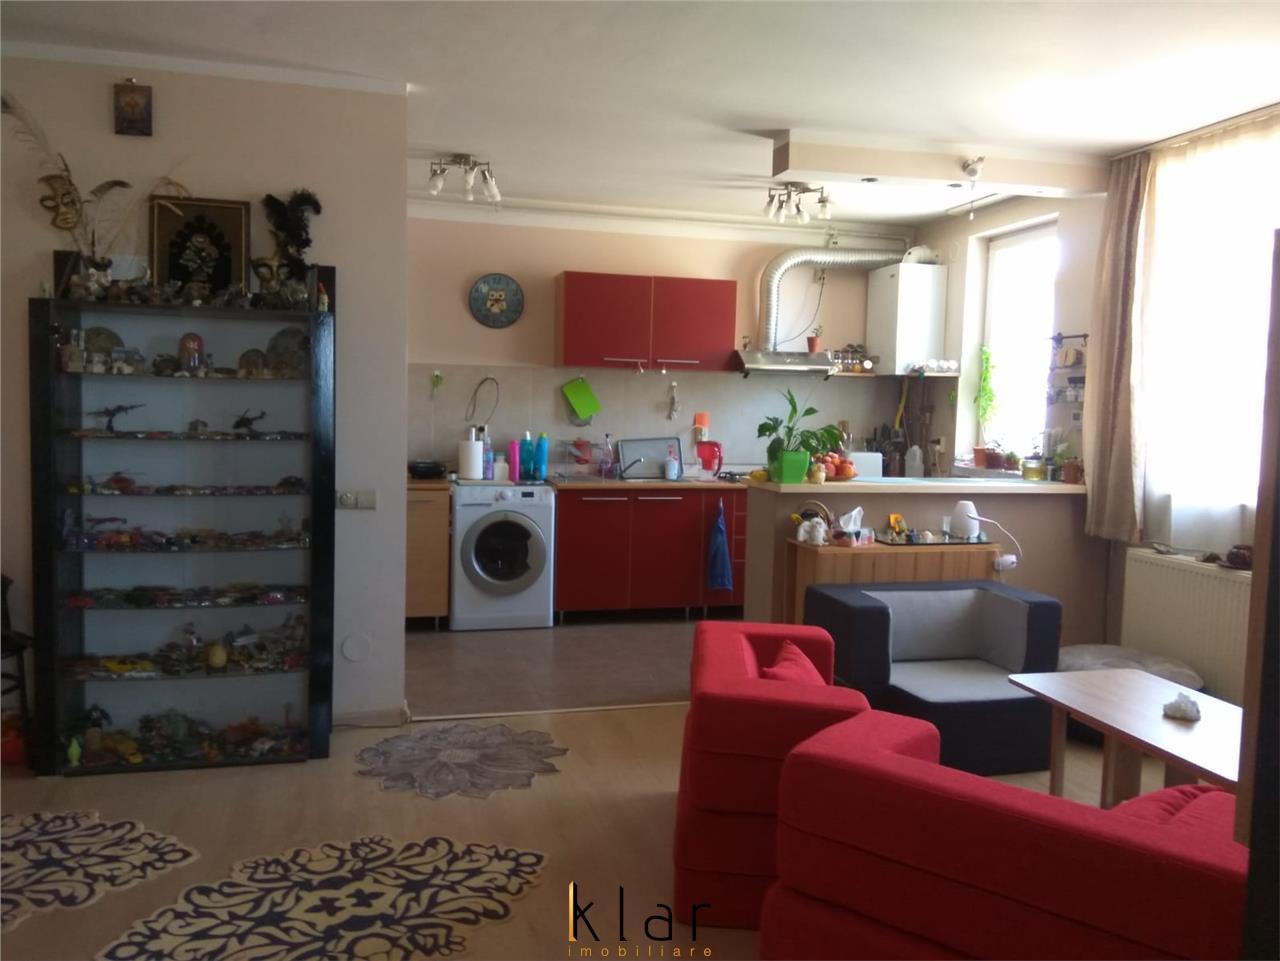 Apartament 2 camere, foarte spatios, zona aerisita!